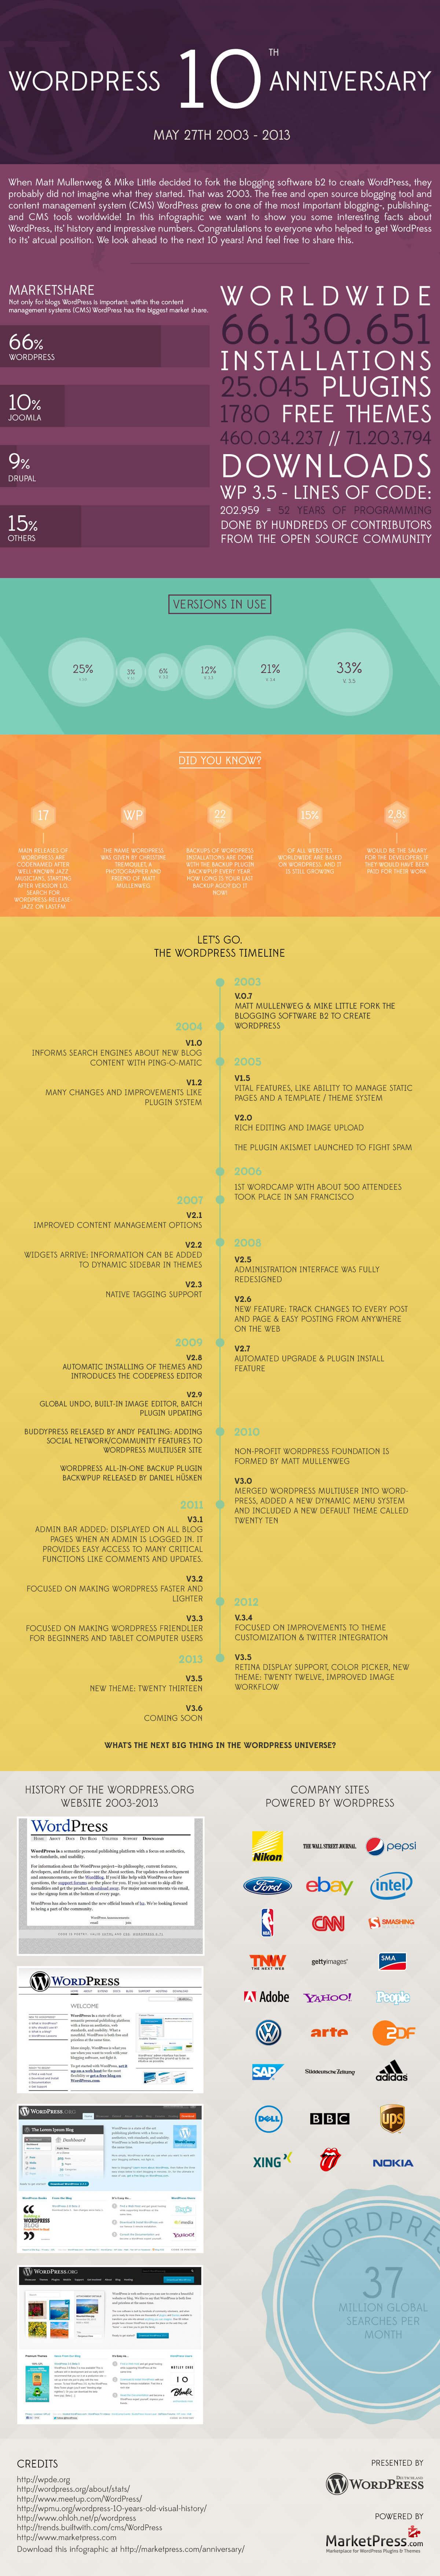 WordPress_10_years_anniversary_Infographic_by_marketpressCOM WordPress cumple 11 años (en 2014)